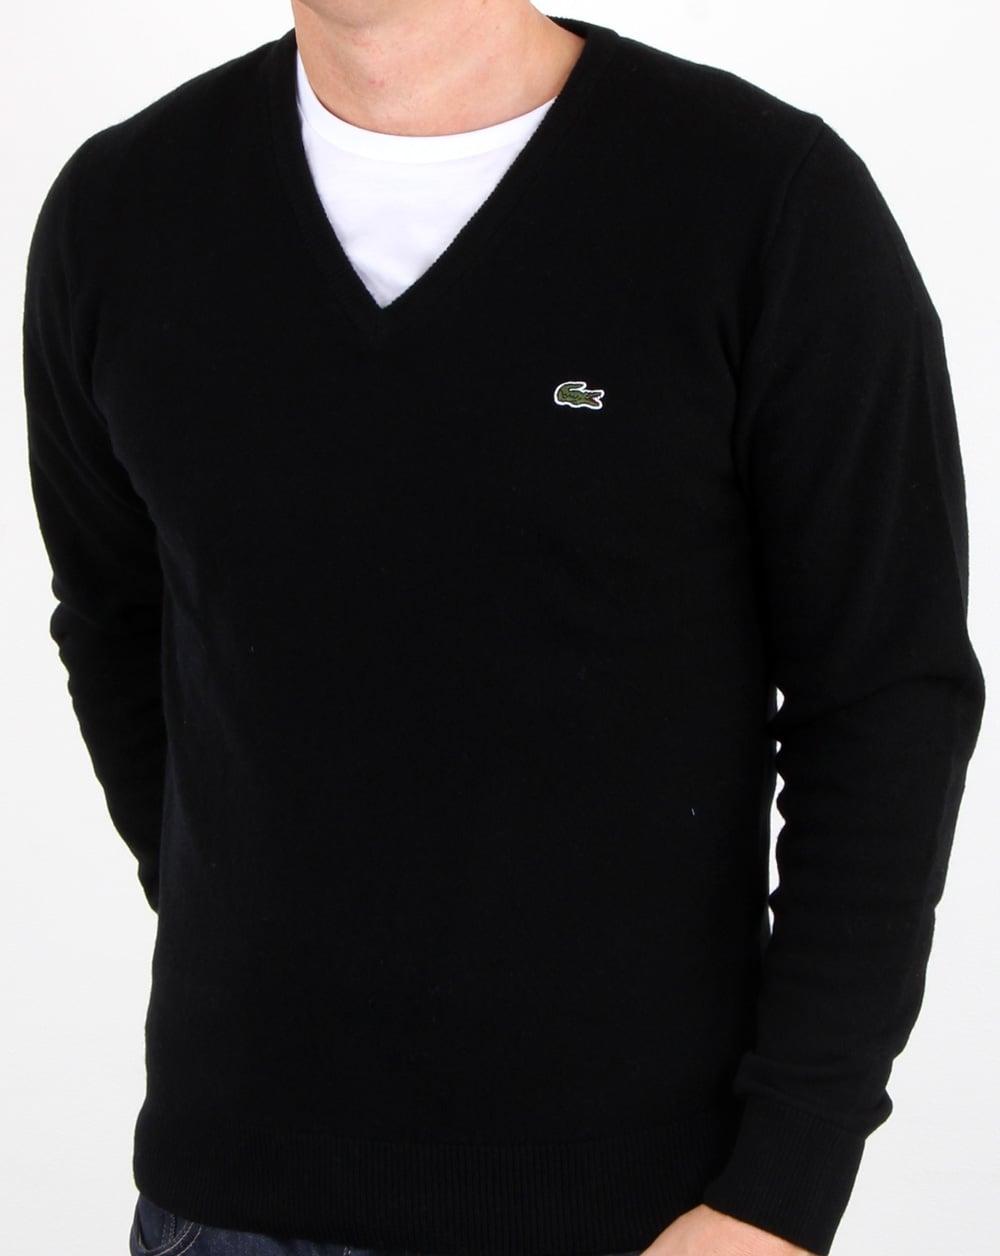 63cb48098f1 Lacoste Wool V Neck Jumper Black